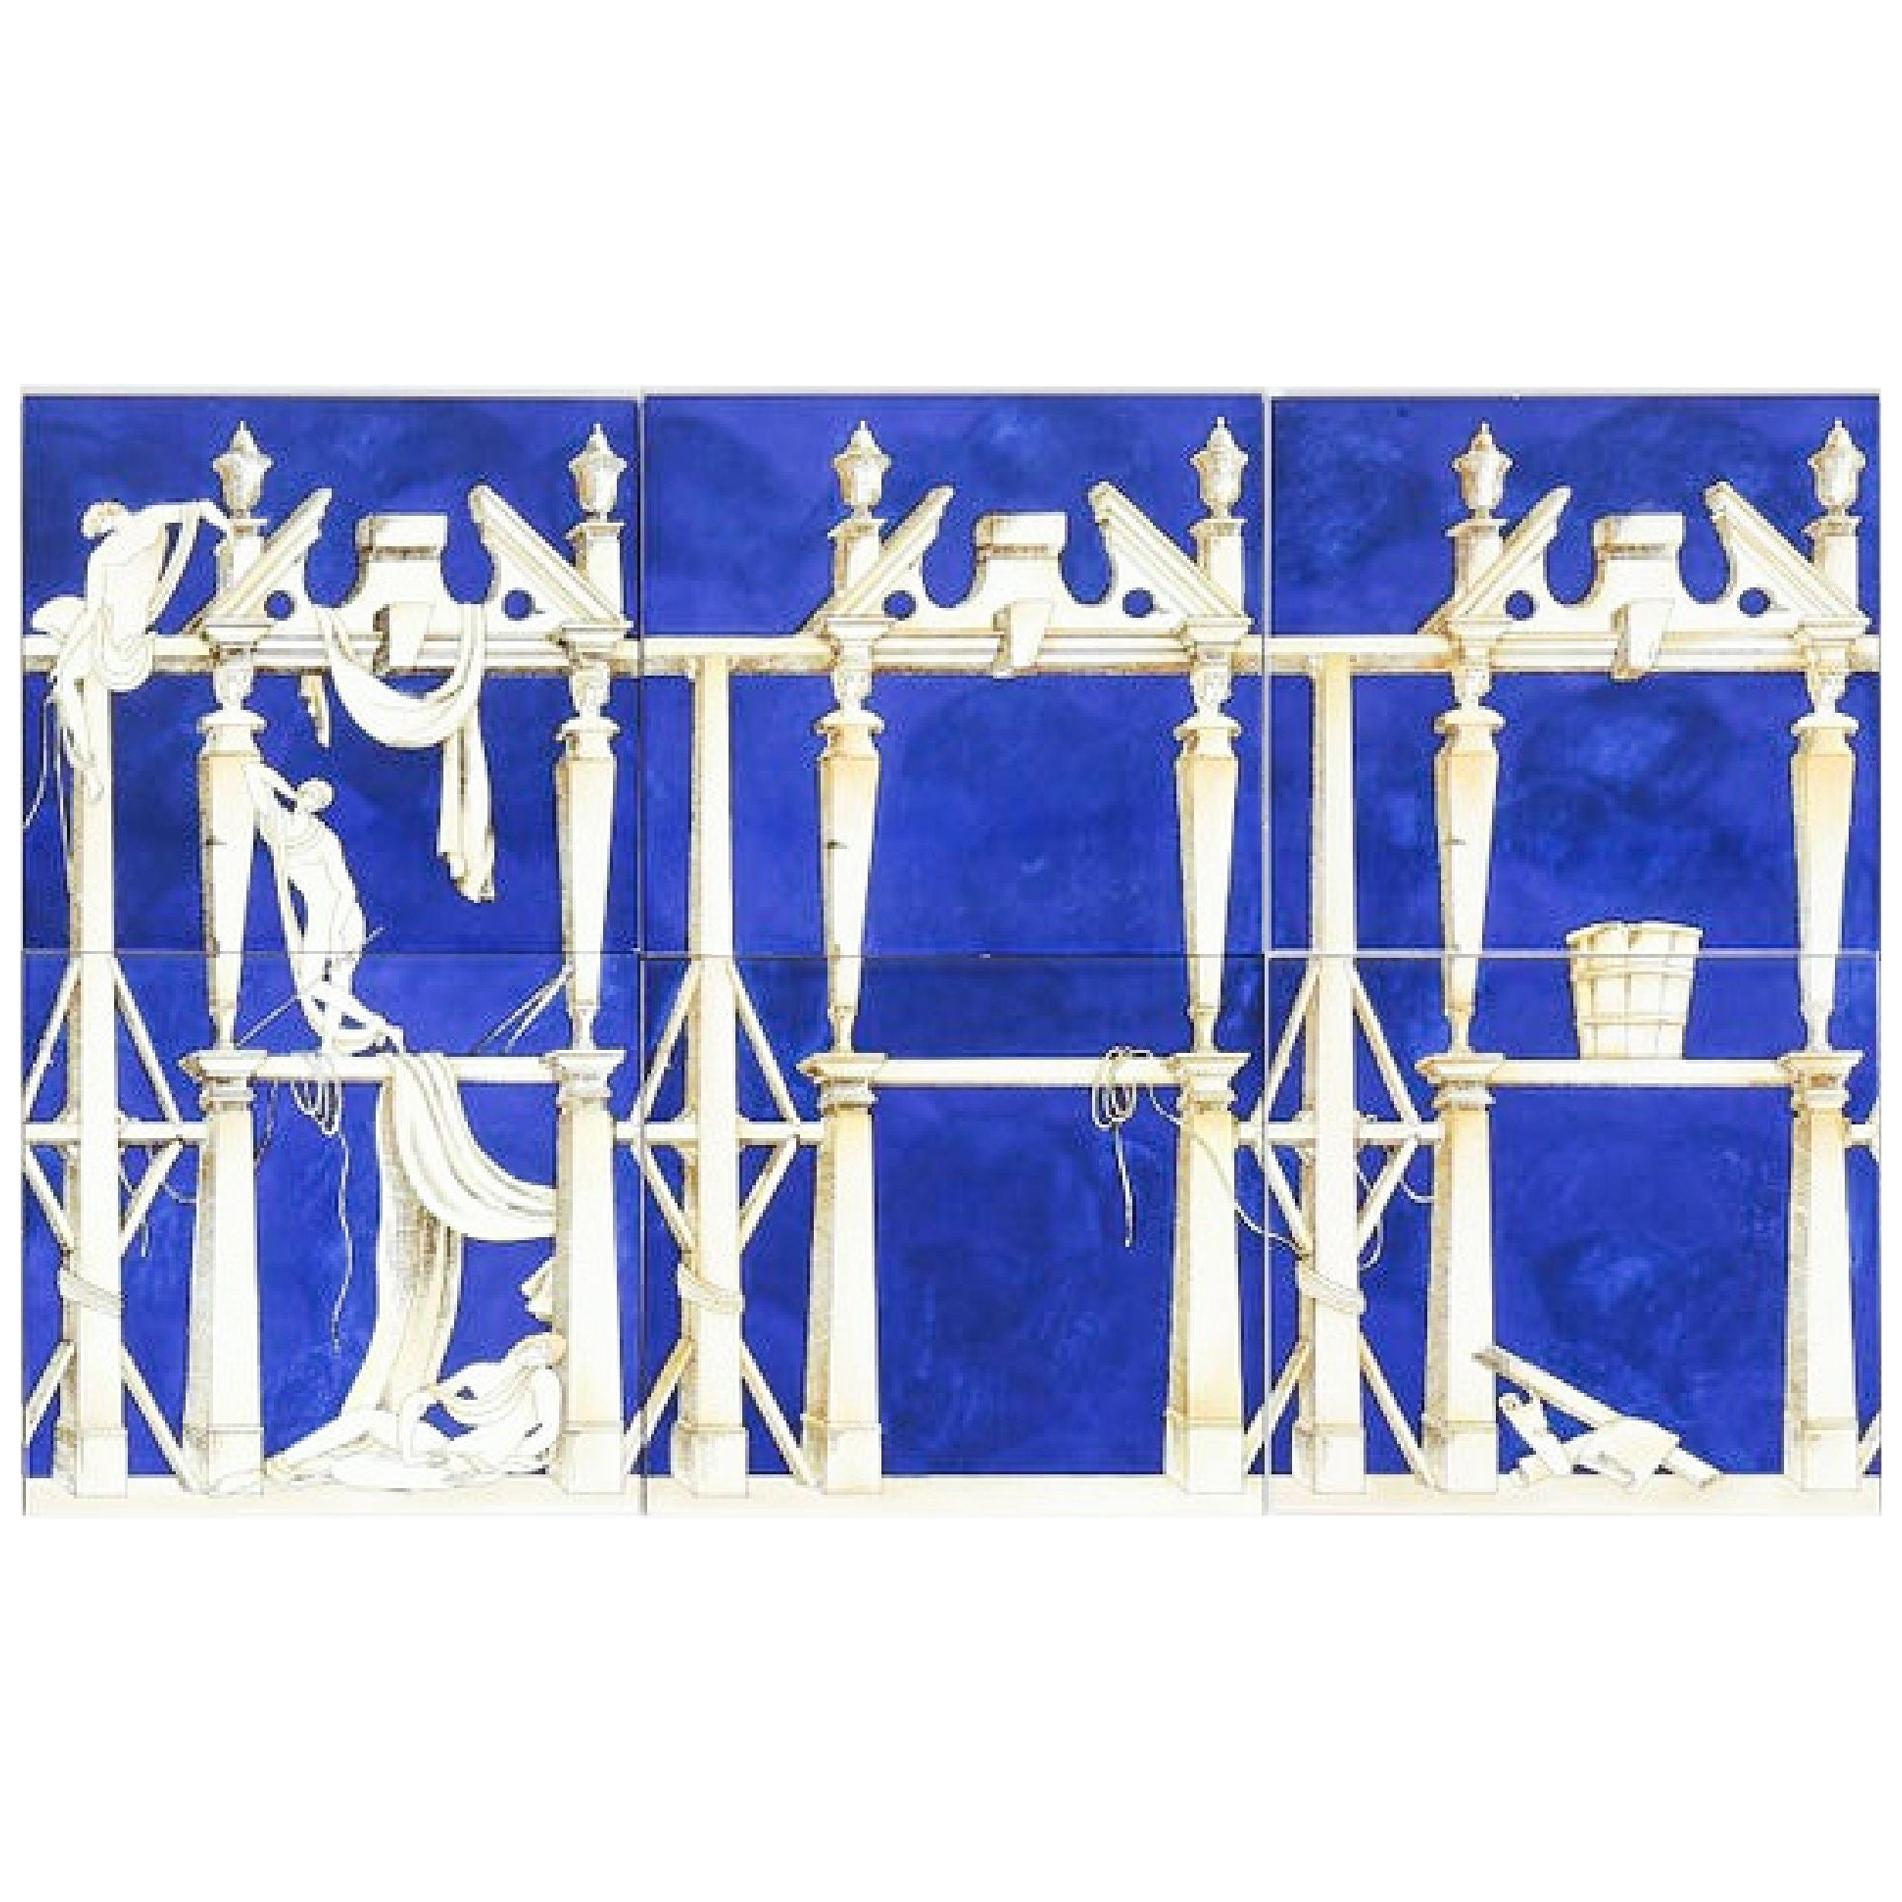 Vintage Gio Ponti for Ceramica Bardelli Casa dell'Efebo Porcelain Tile Set of 6